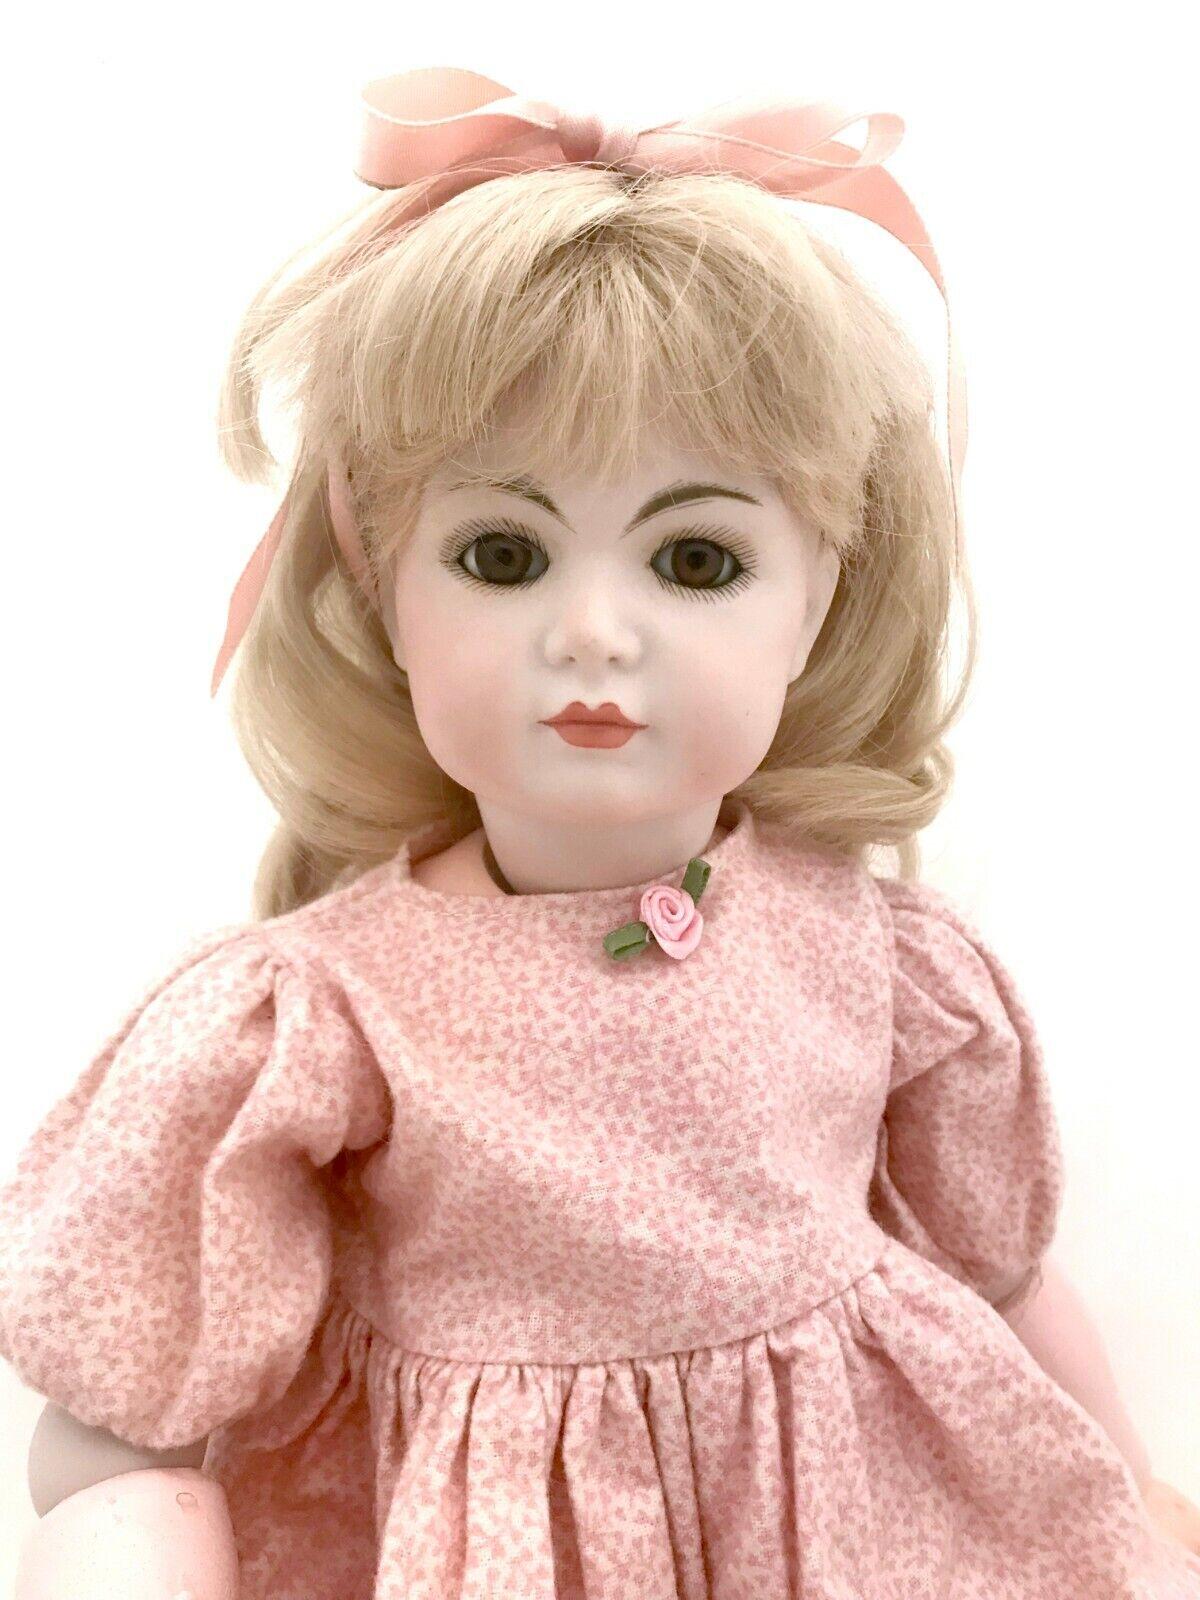 18  Antique Repro 117 A Simon Halbig German Bisque Doll Head By Oalseg 1982